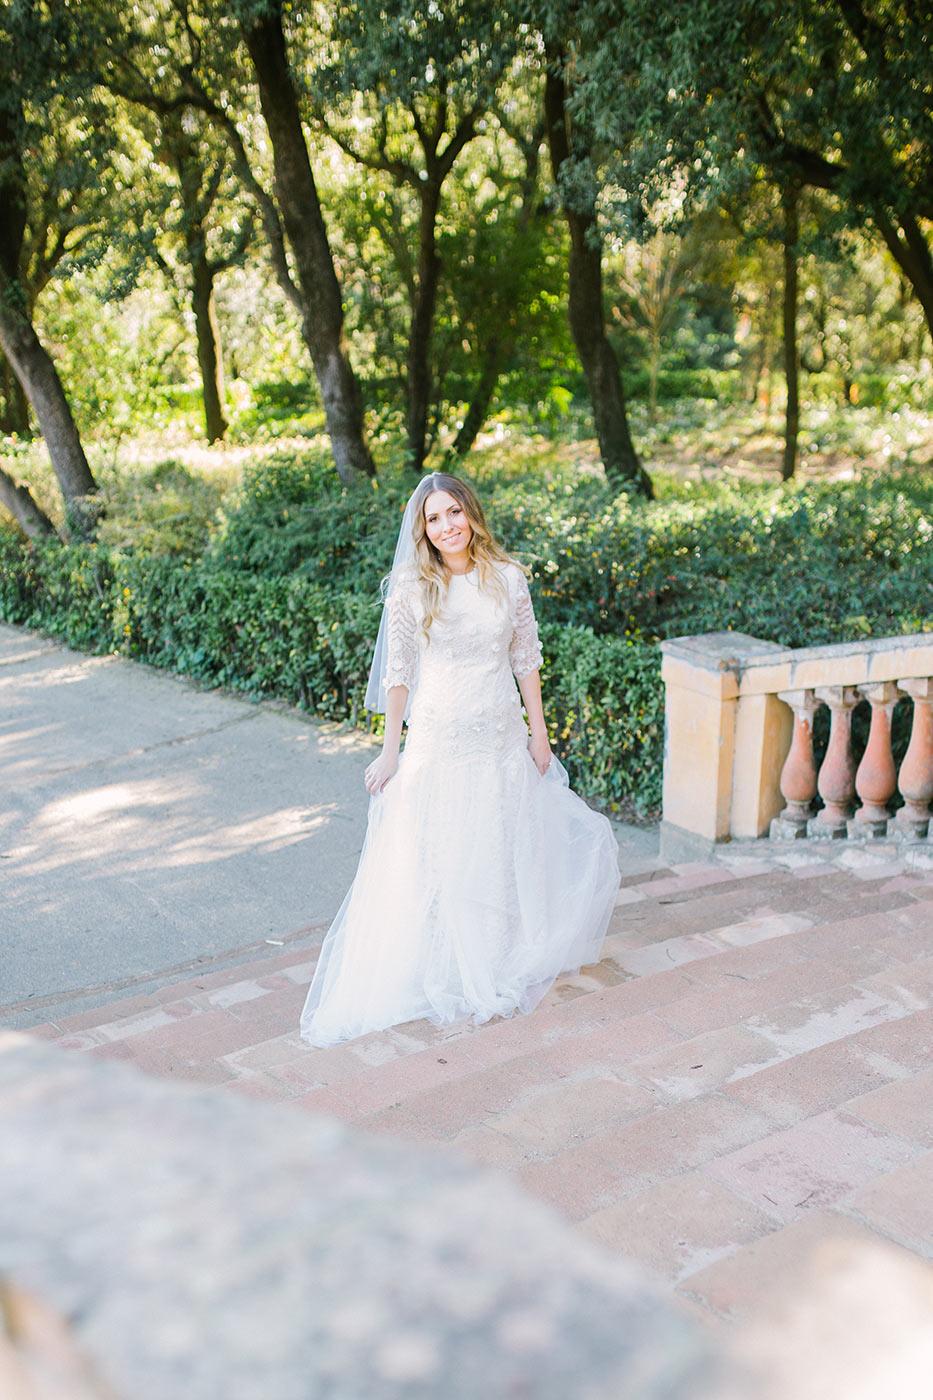 Romantic close up portrait | Fine Art Photographer | Lena Karelova Photography | Destination Wedding Photographer Barcelona |Film Wedding Photographer